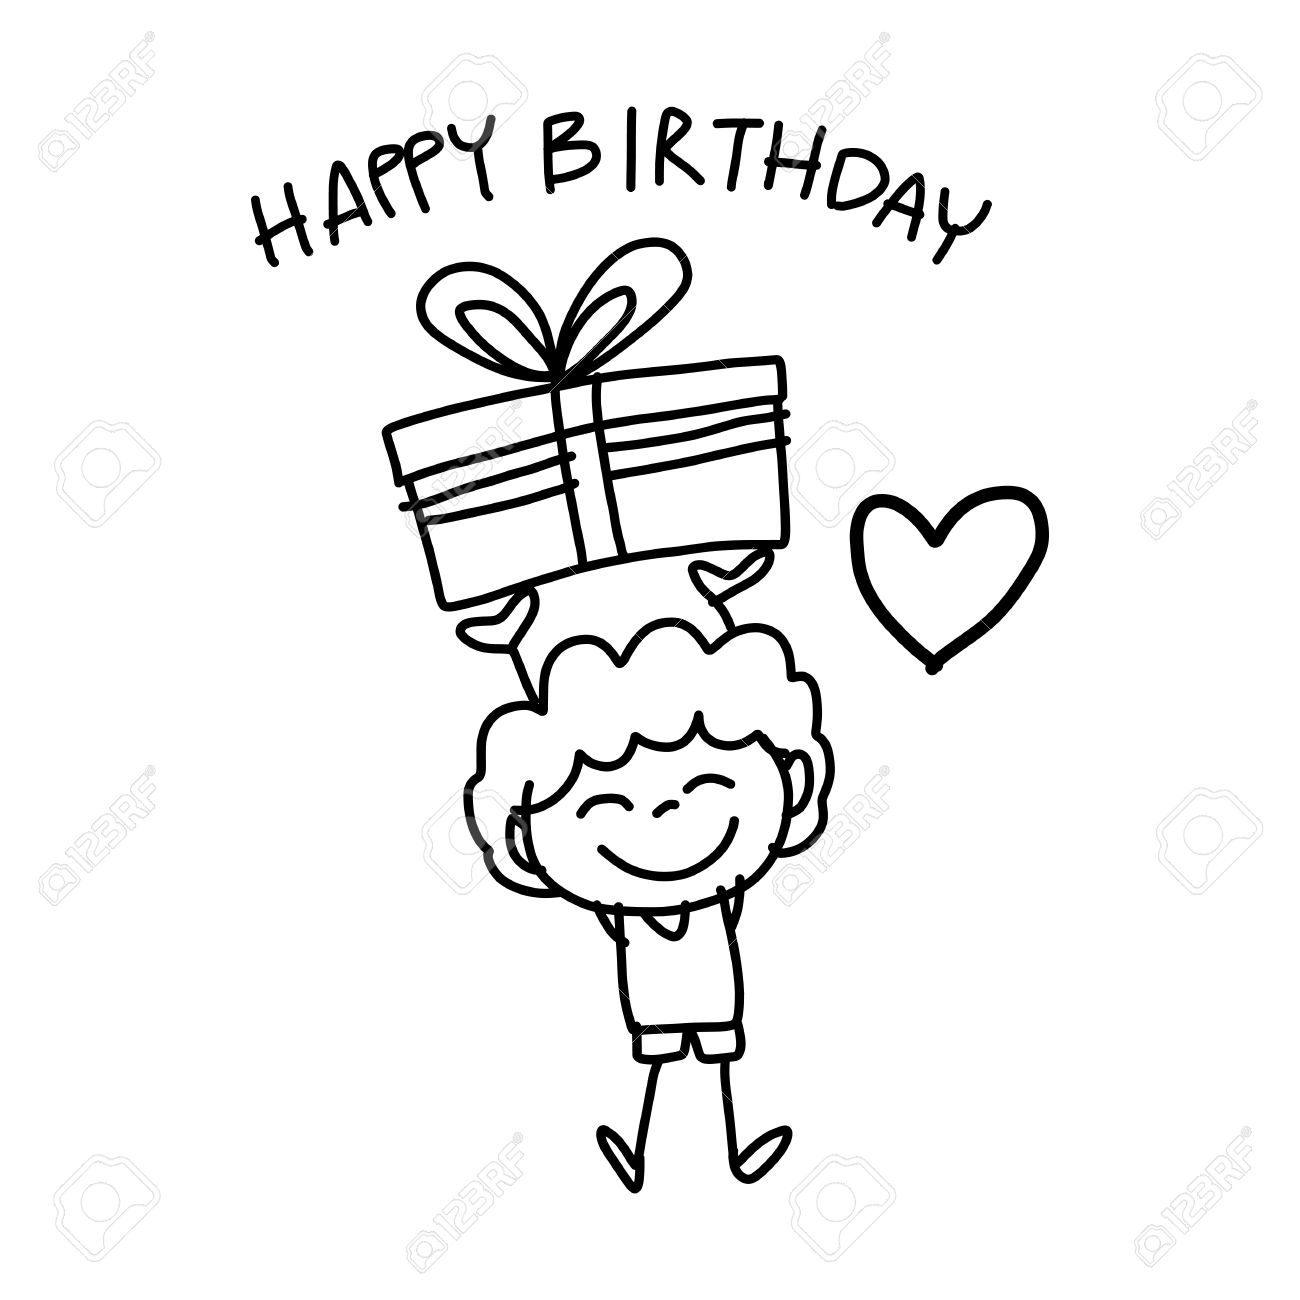 1300x1300 Birthday Cartoon Drawings Vector Of A Cartoon Happy Birthday